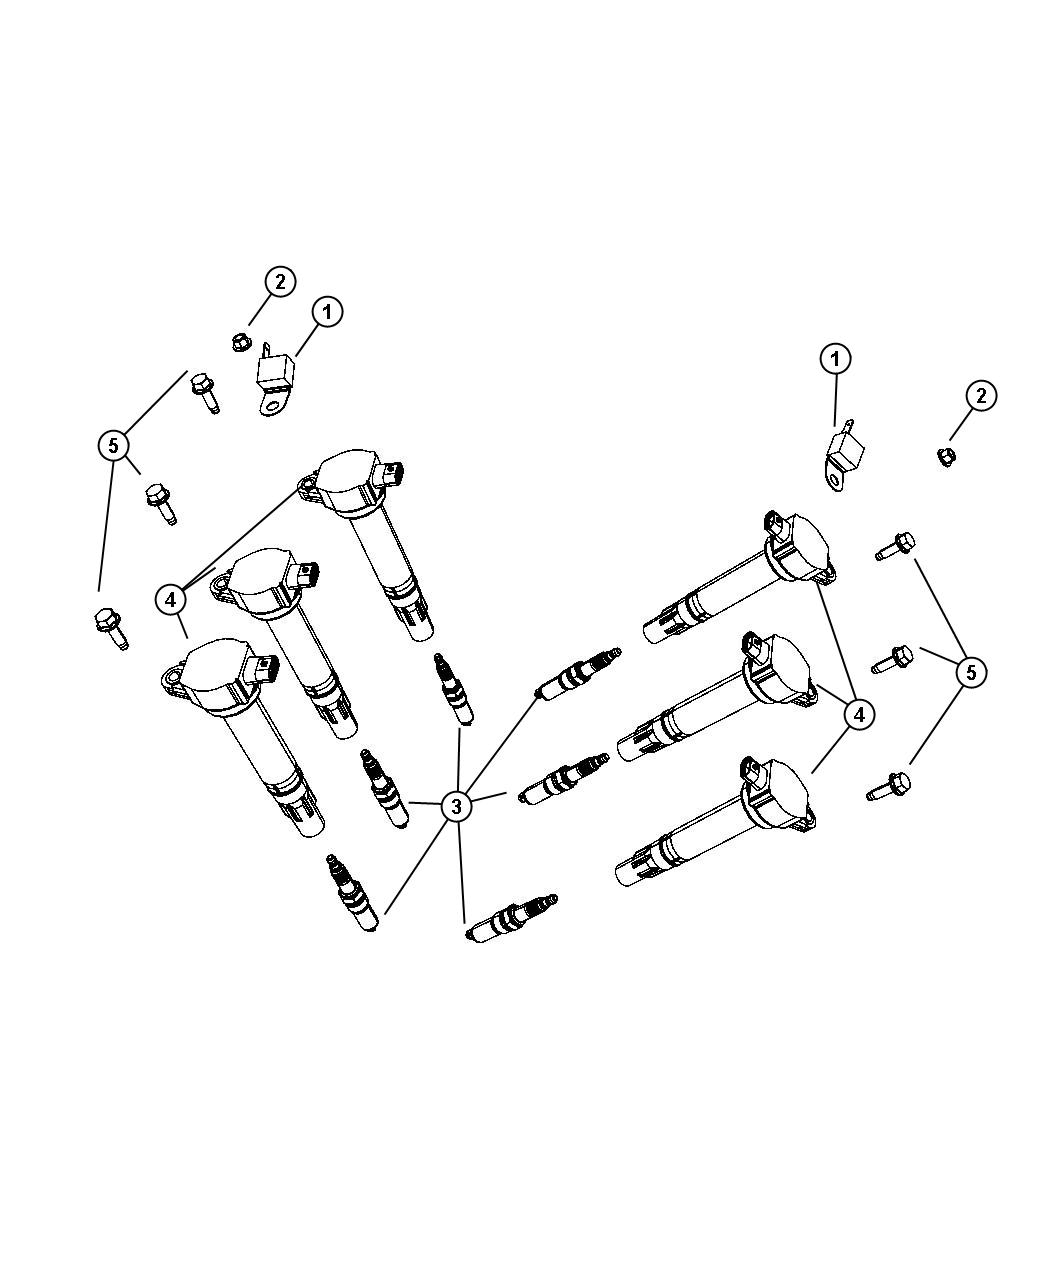 Chrysler Sebring Spark Plug Up To 06 16 Plugs